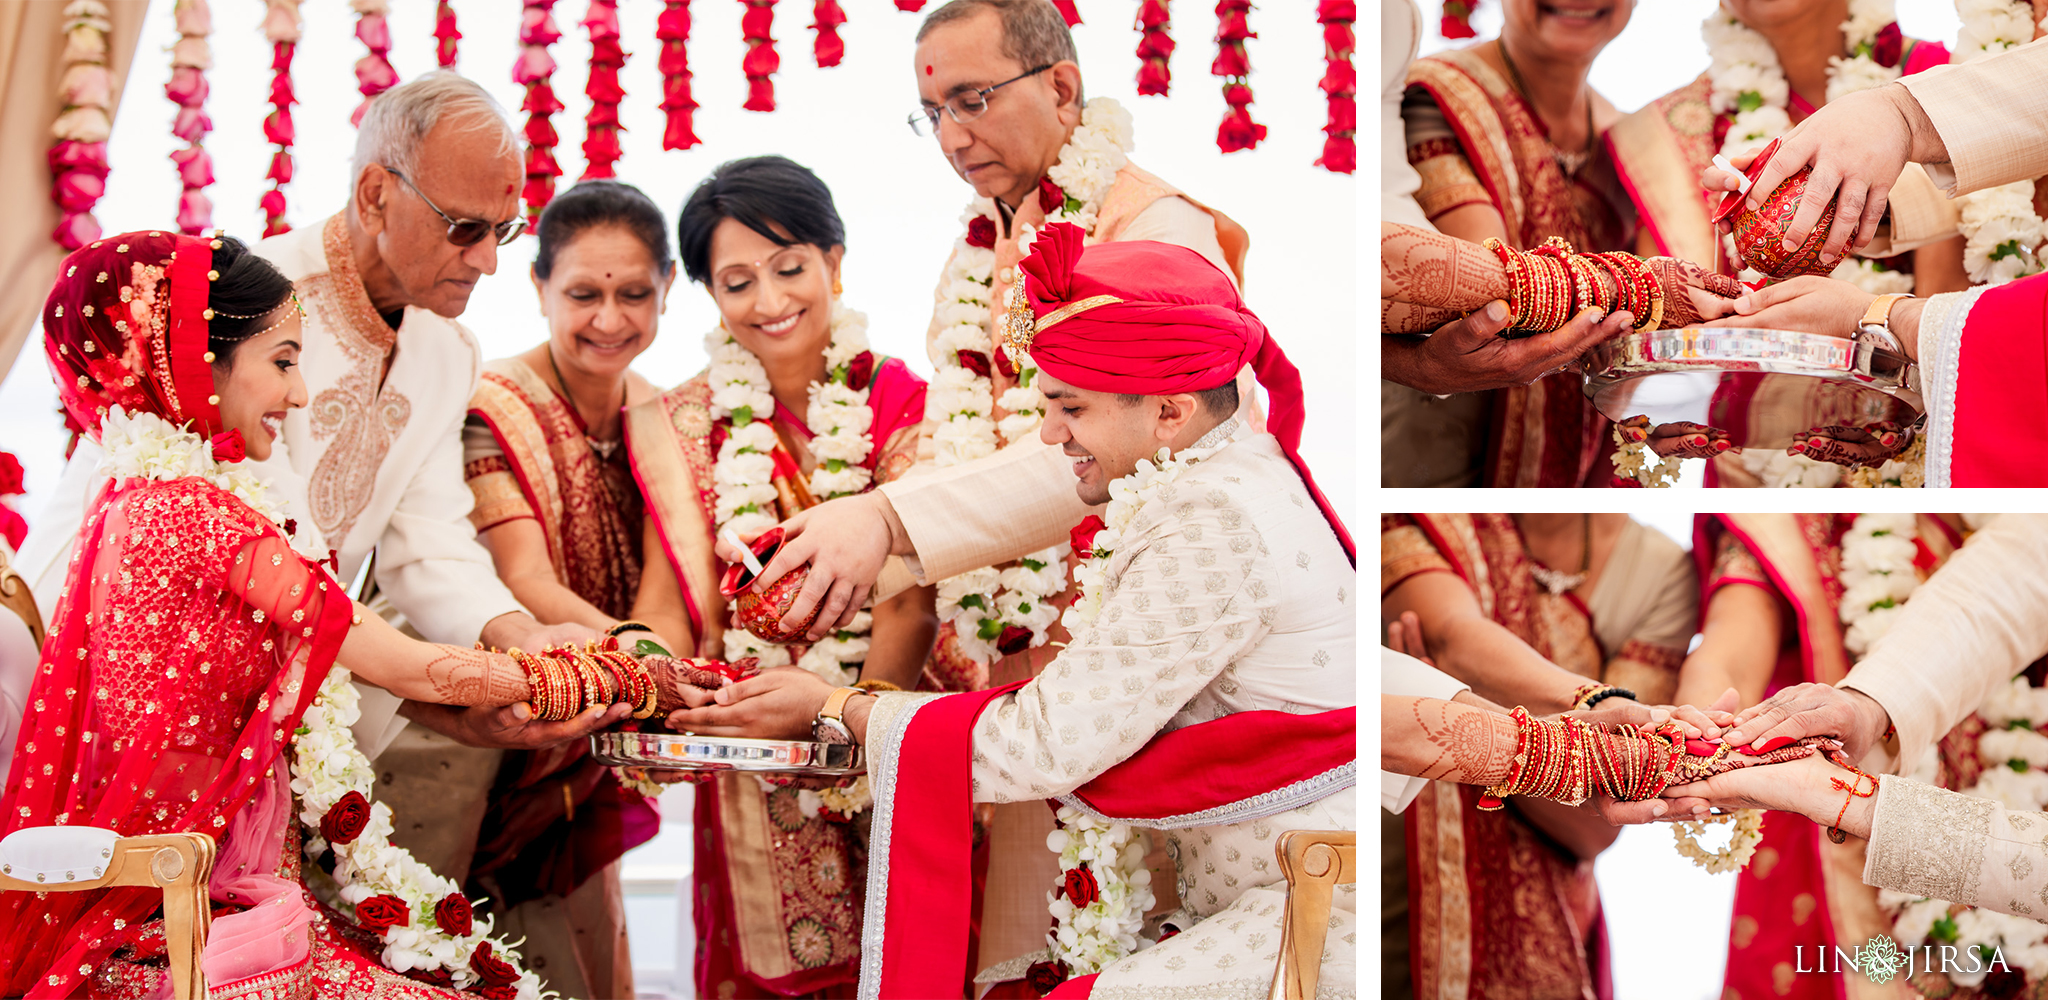 22 Loews Coronado Bay Resort San Diego Indian Wedding Photography